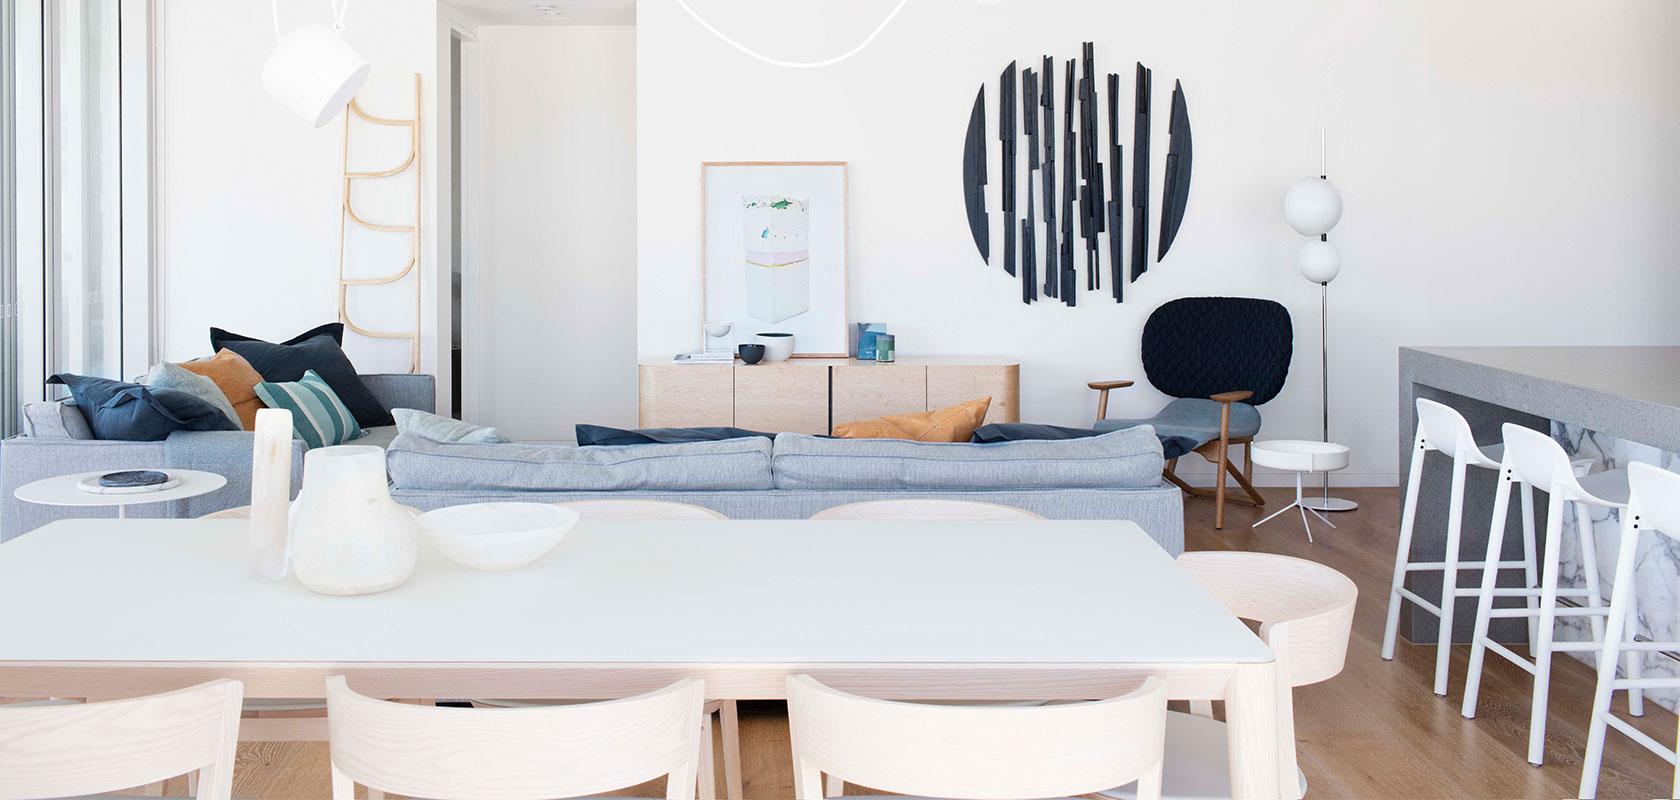 ... Smith table; Photographer: Francoise Baudet